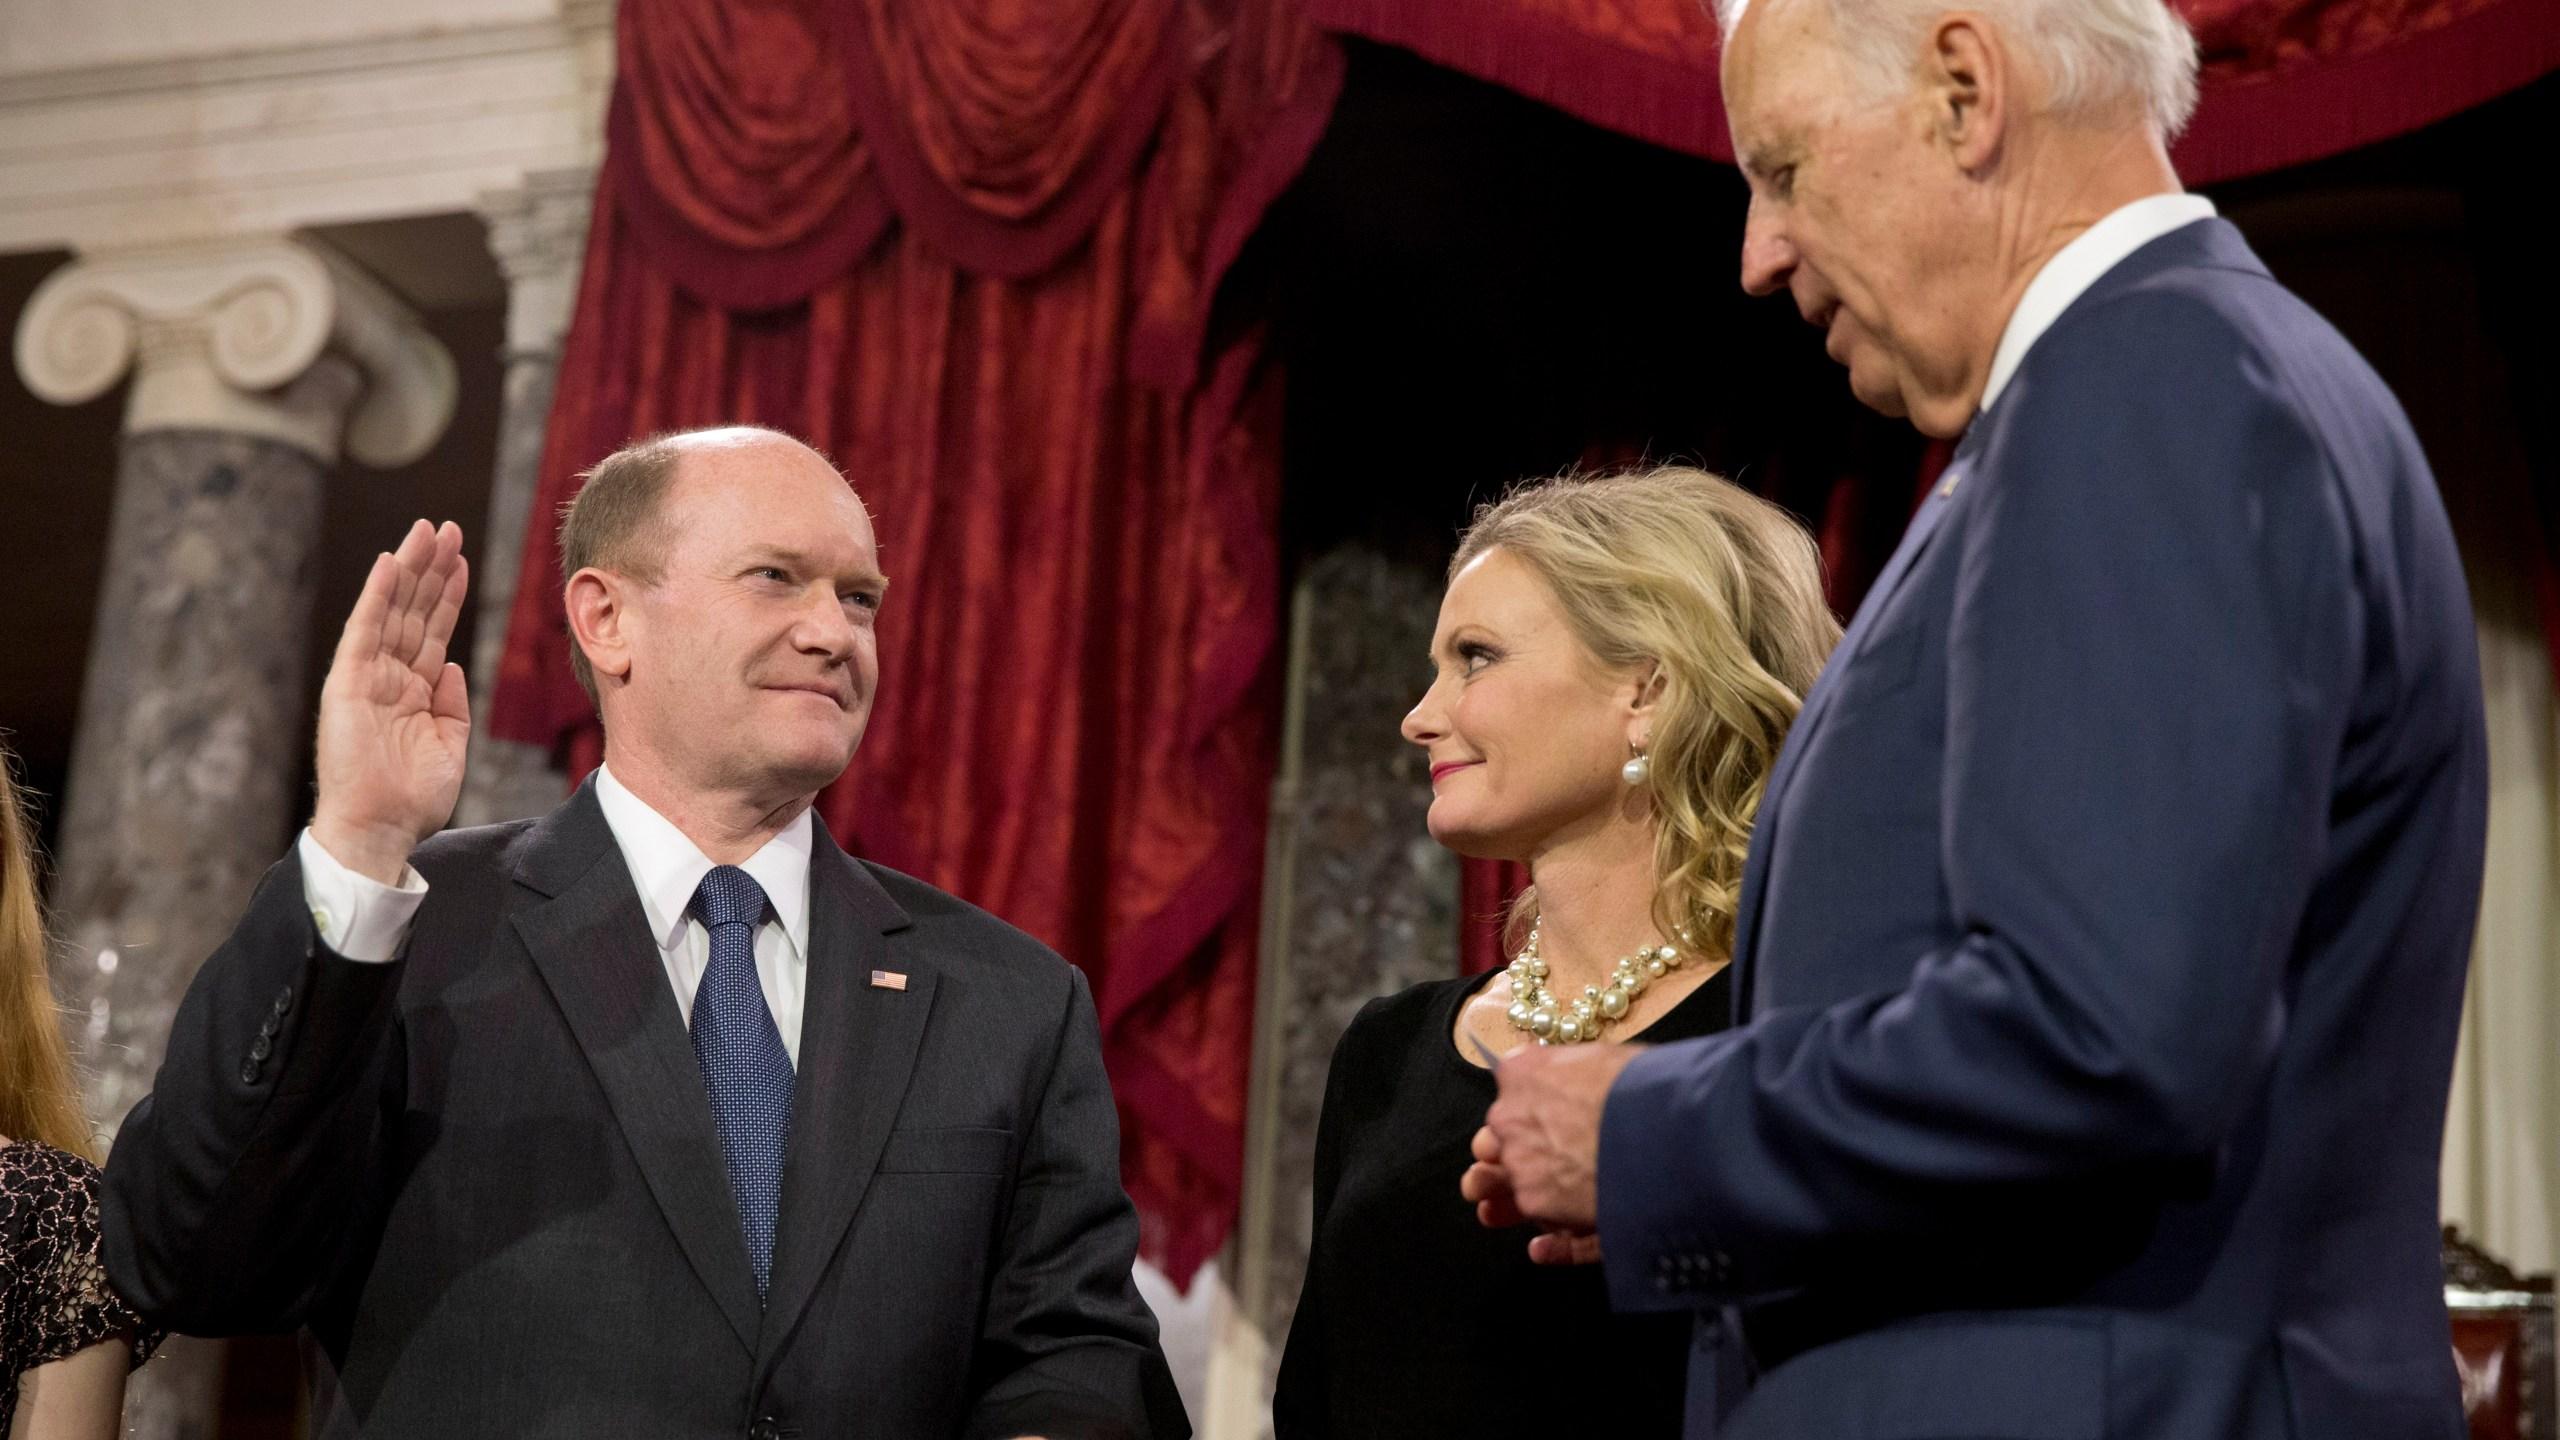 Joe Biden, Chris Coons, Annie Coons